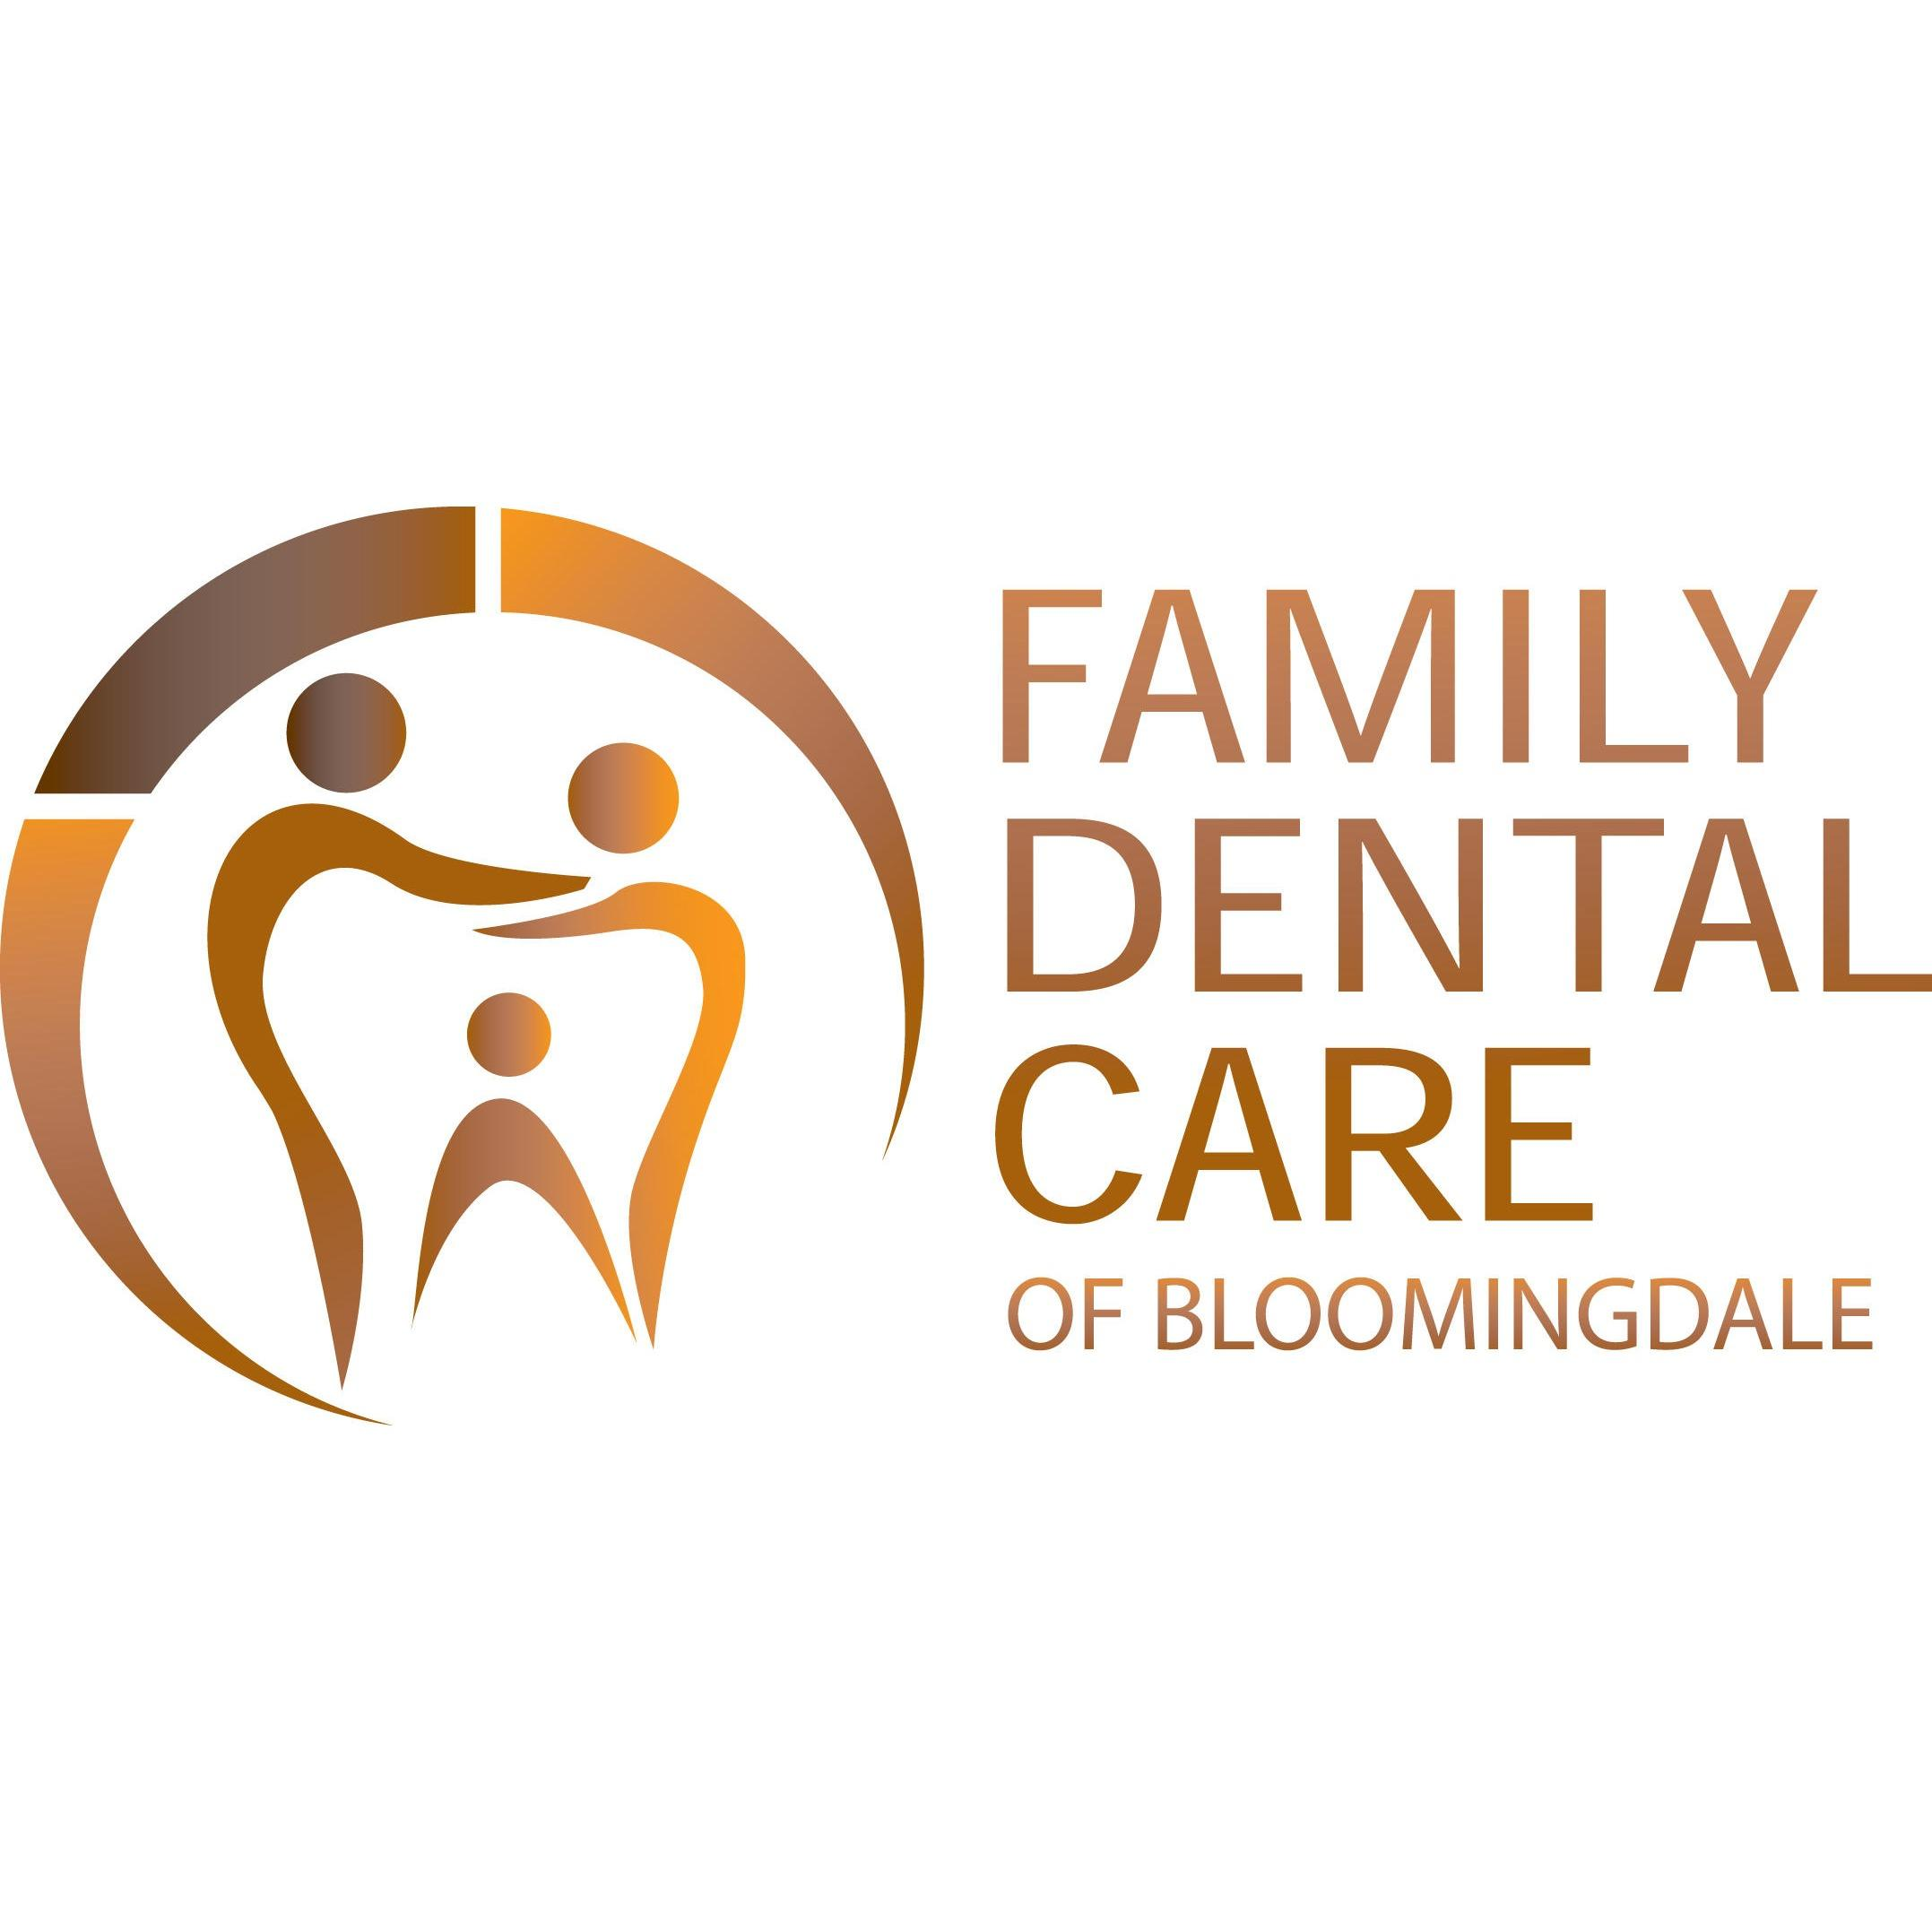 Family Dental Care of Bloomingdale